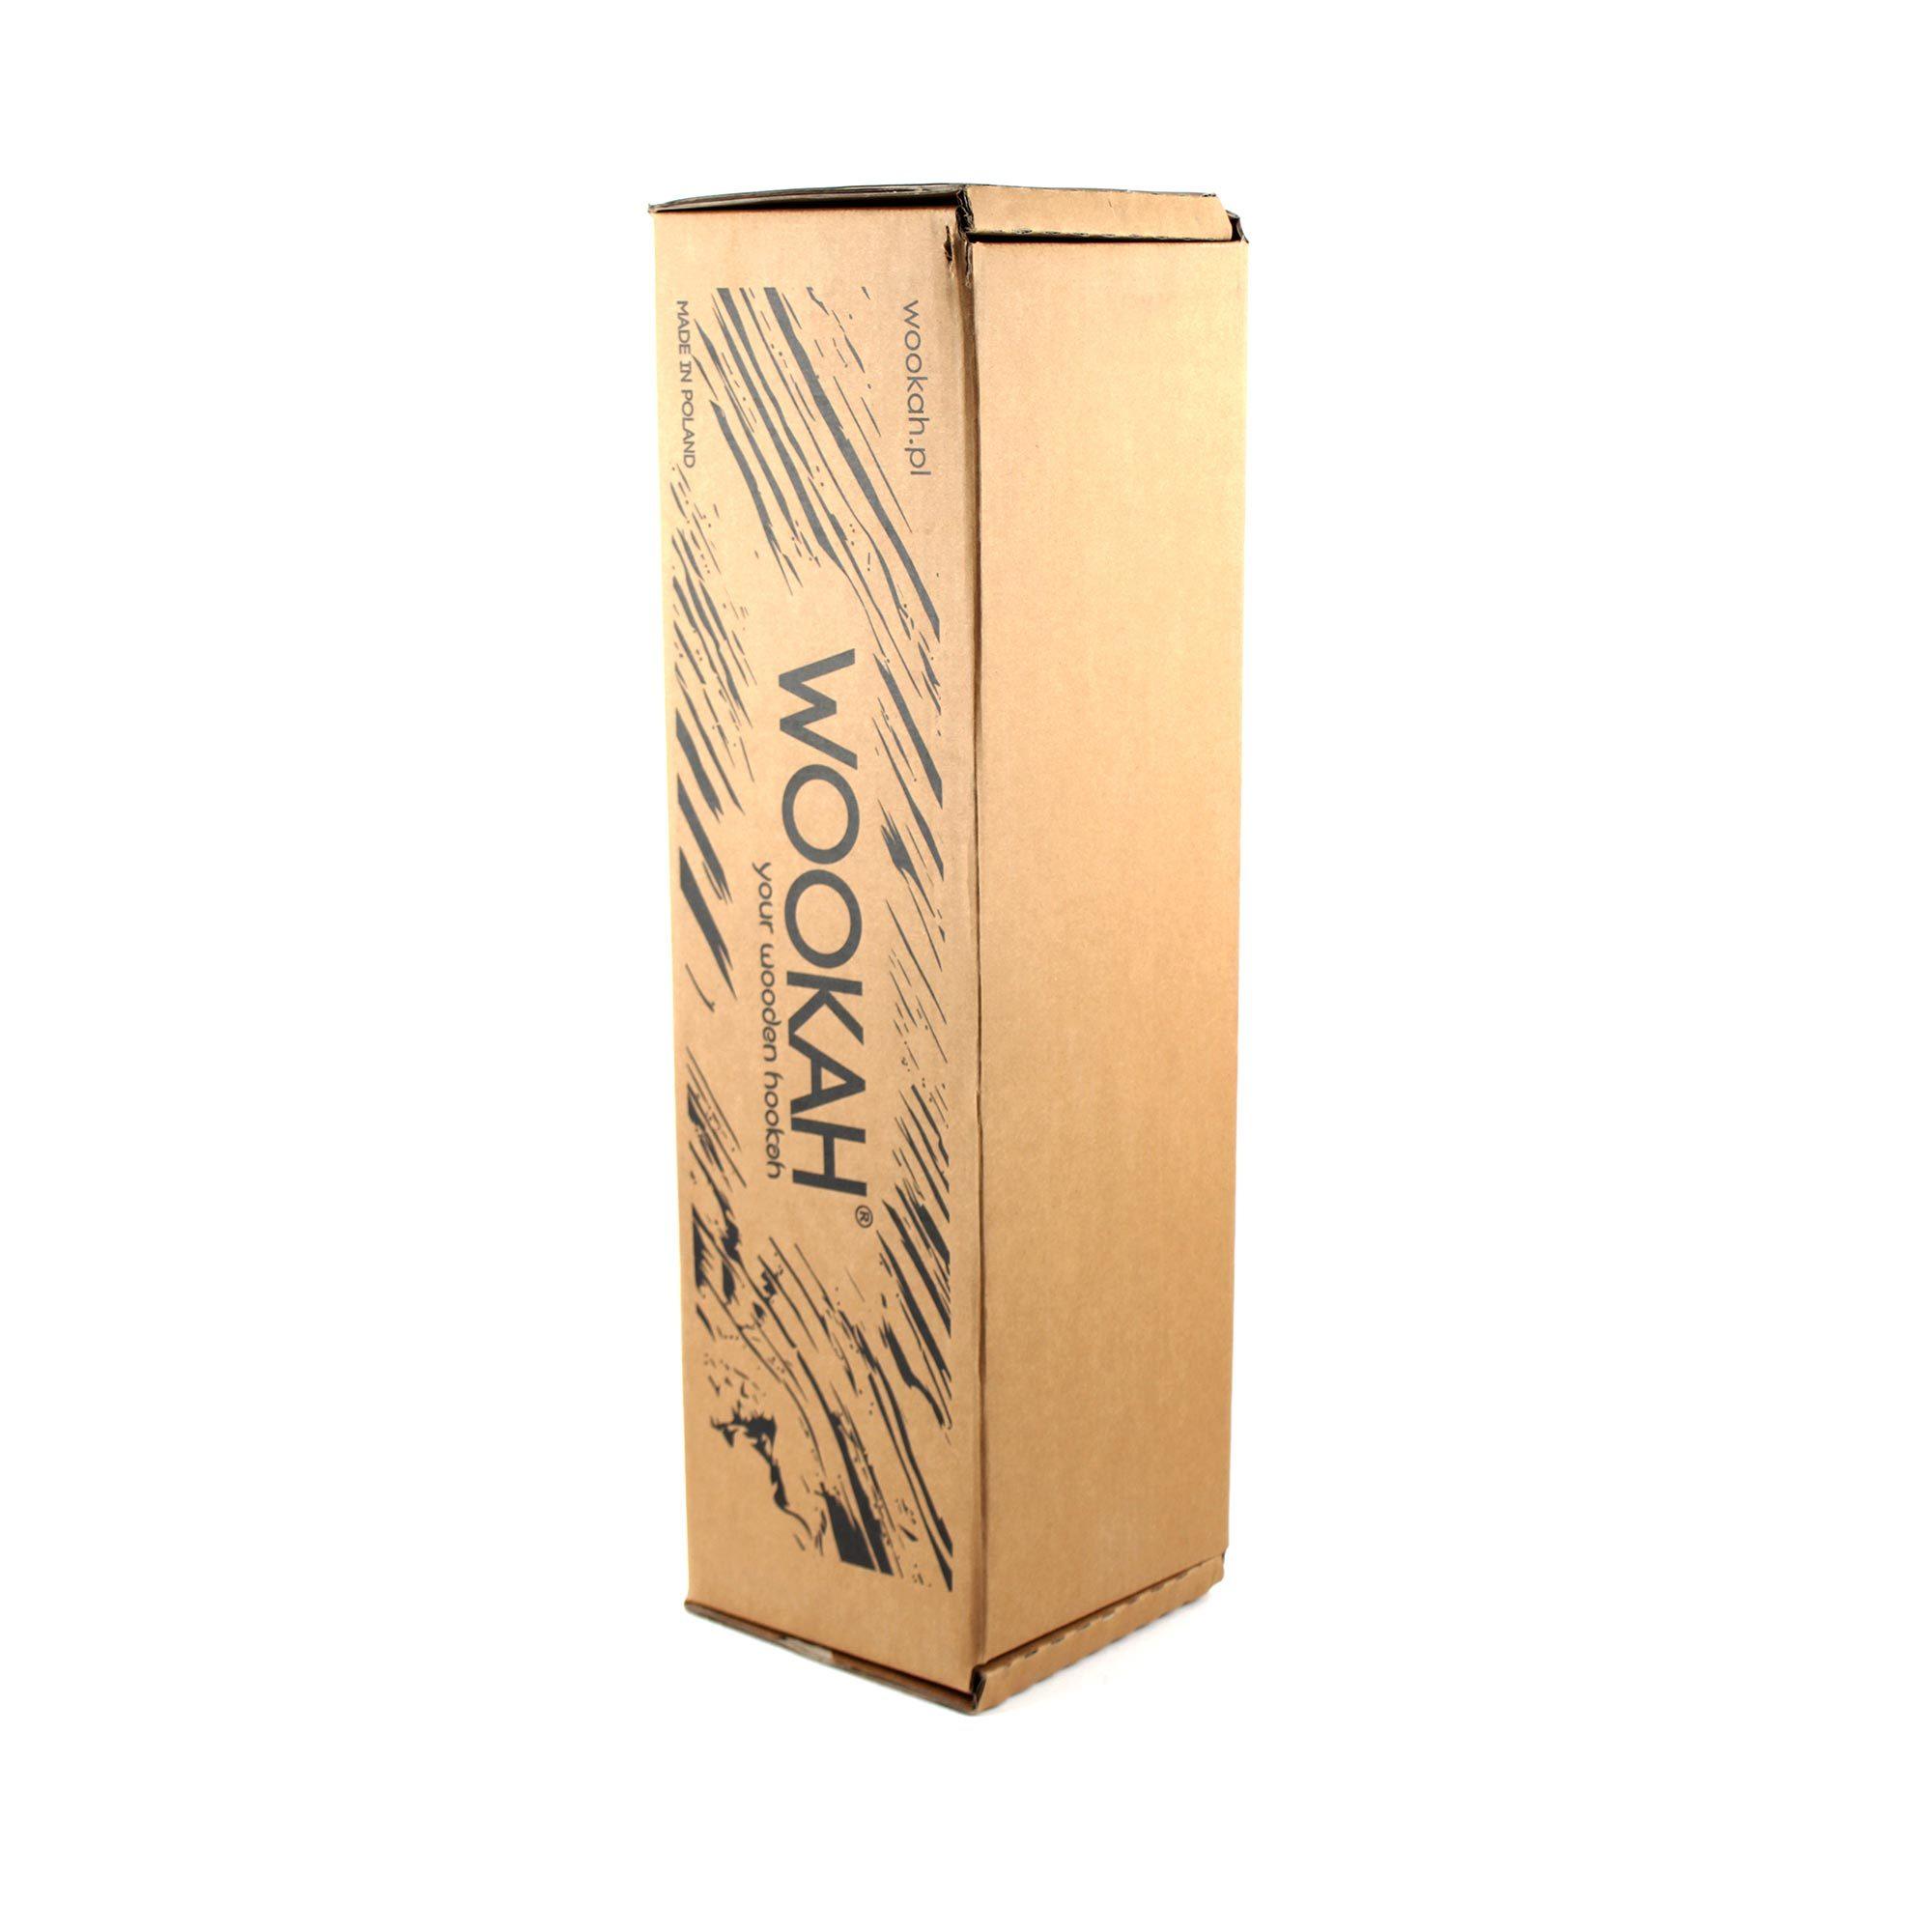 Фирменная коробка Wookah Merbau с колбой Smooth